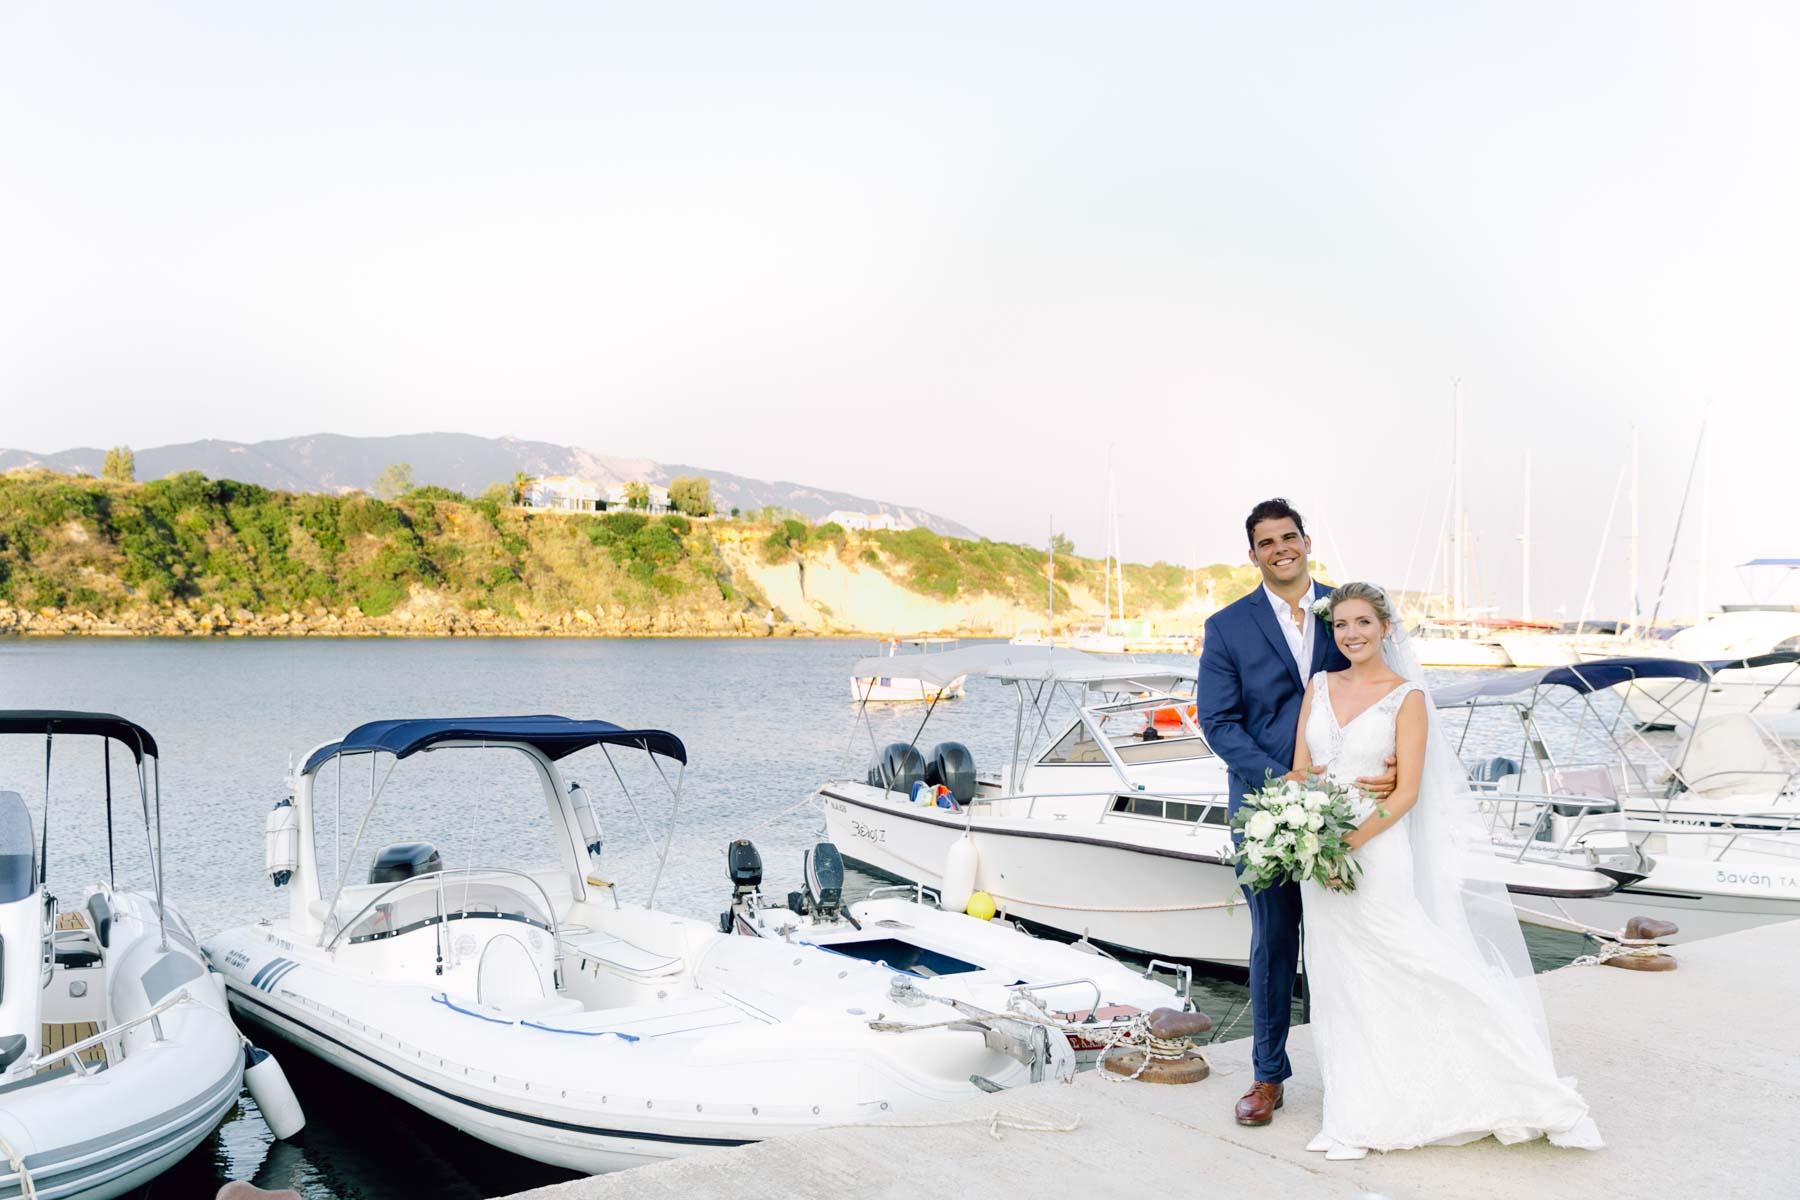 Wedding Celebration of Charlotte and Jason by Vicky and Nikiforos Photography Studio